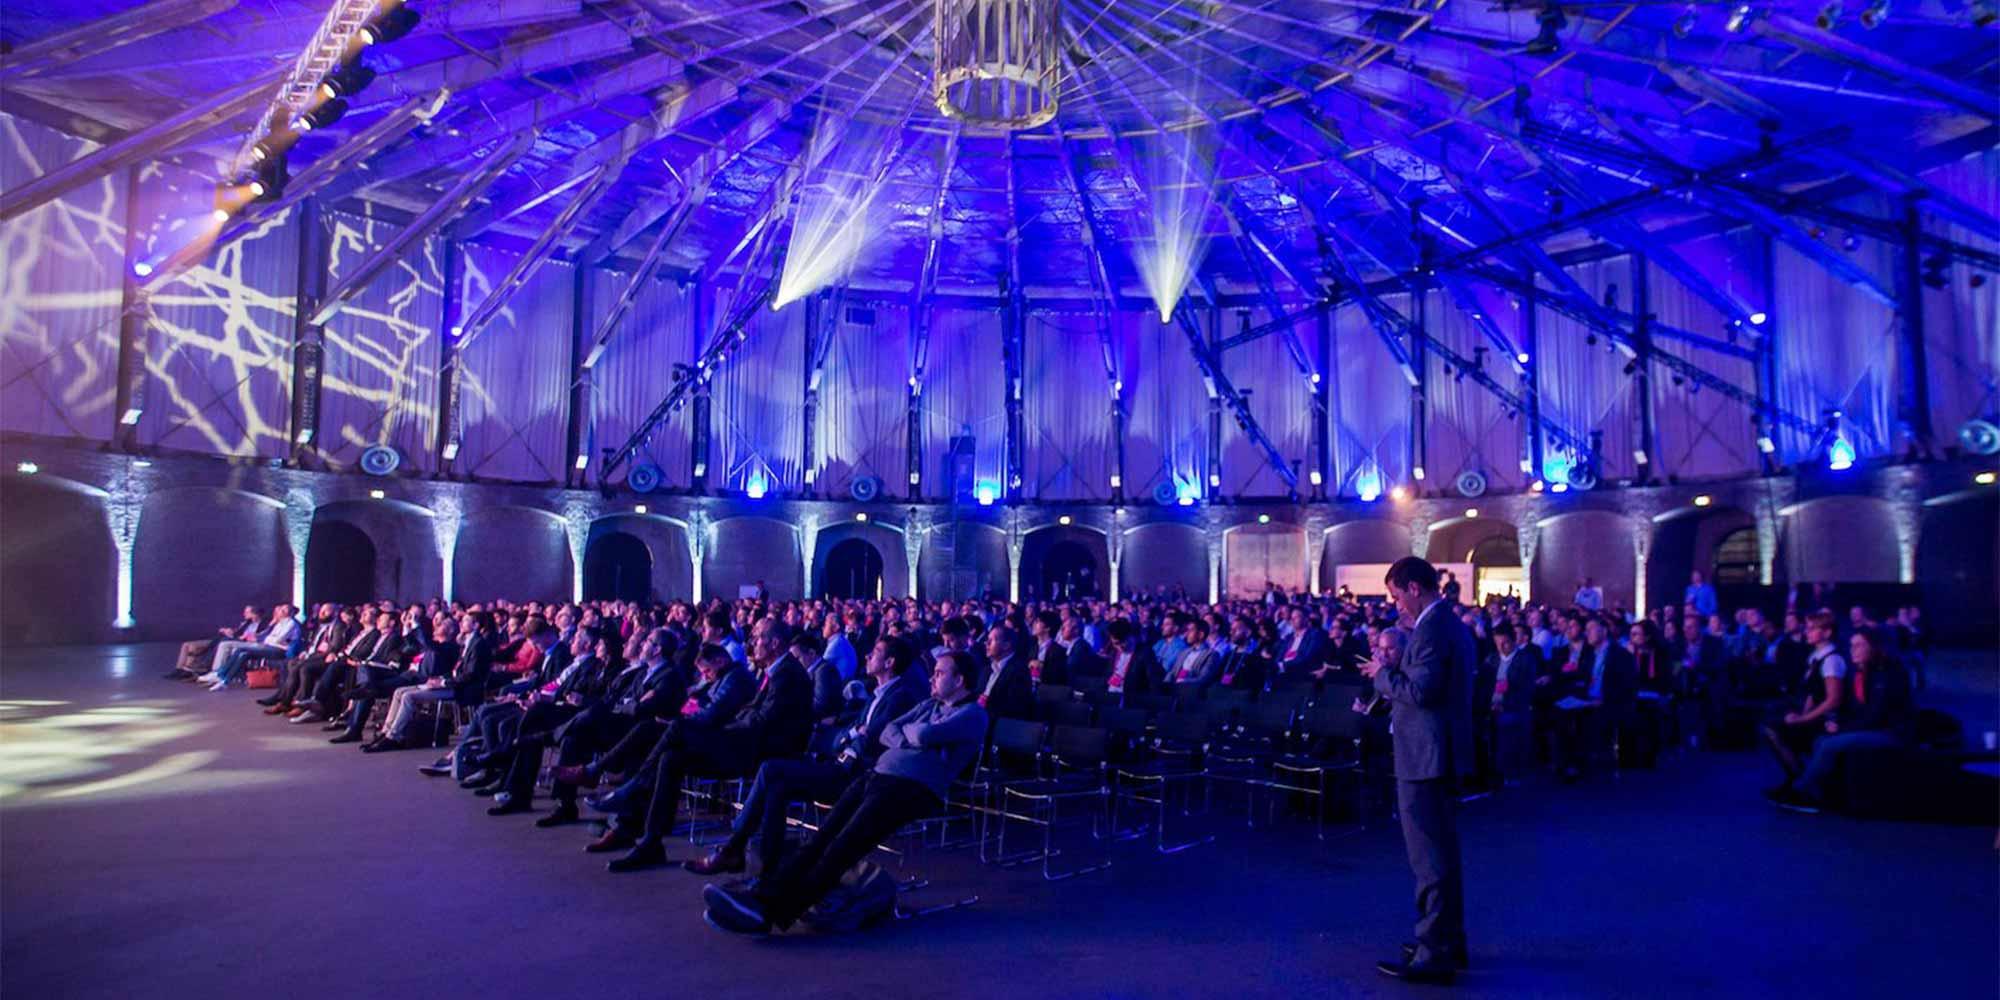 Publikum der Digital Insurance Agenda Amsterdam 2019